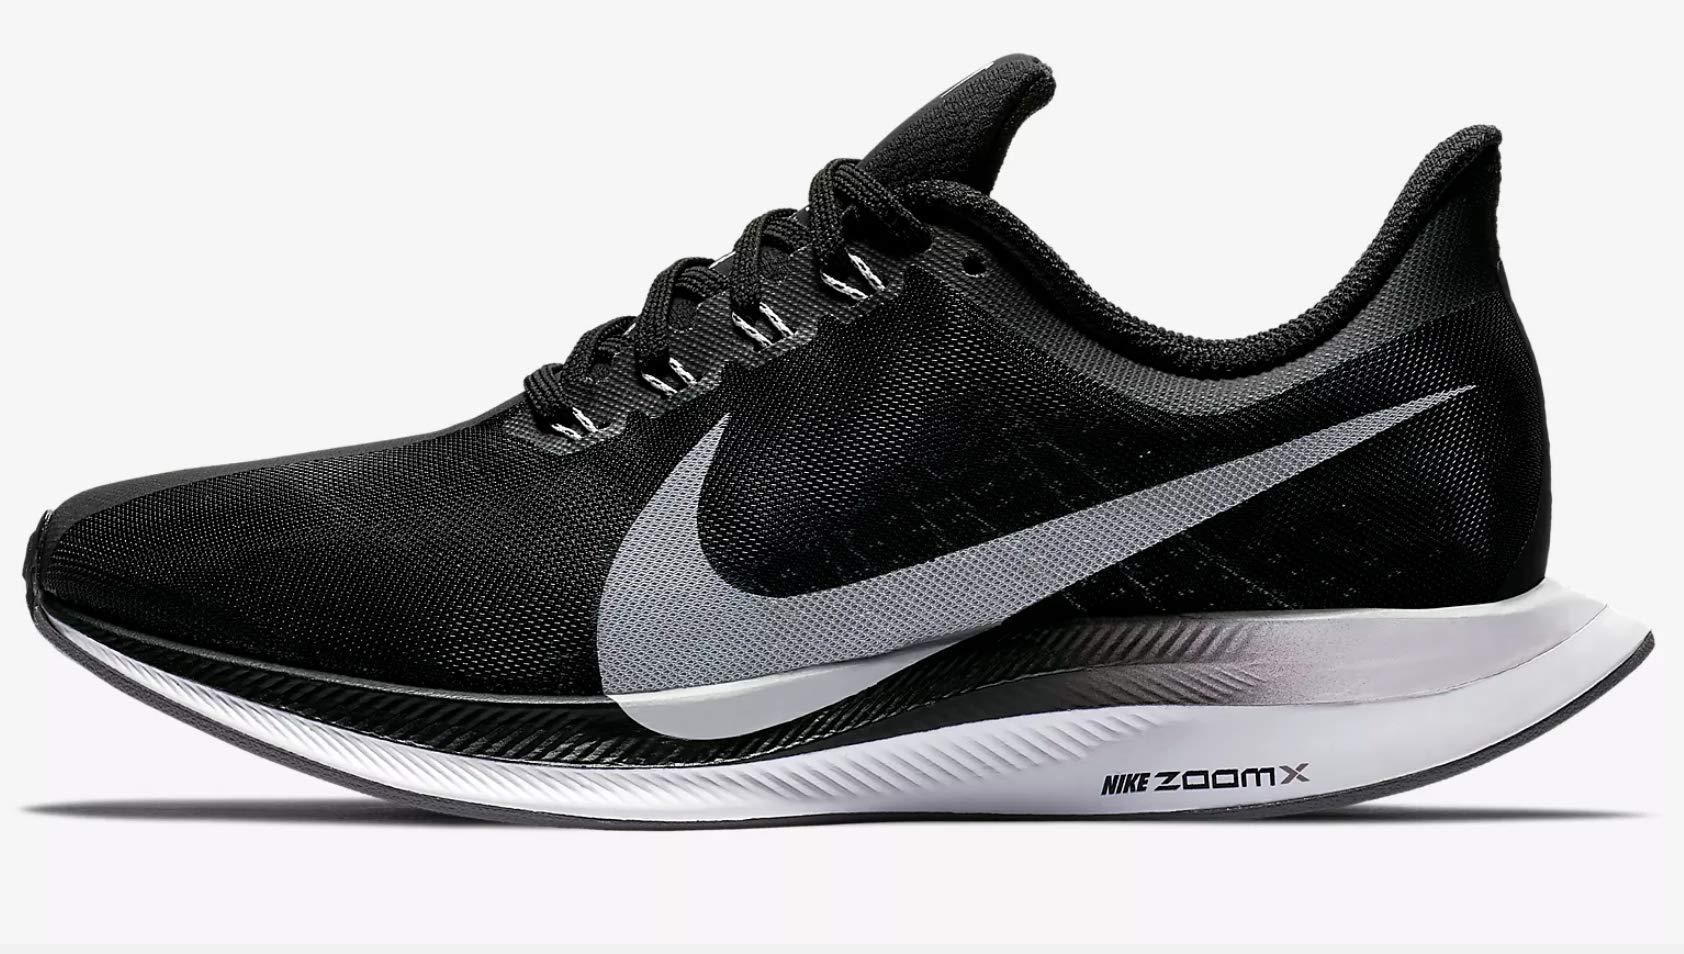 timeless design 3d658 2a588 Nike W Zoom Pegasus 35 Turbo Womens Aj4115-001 Size 12